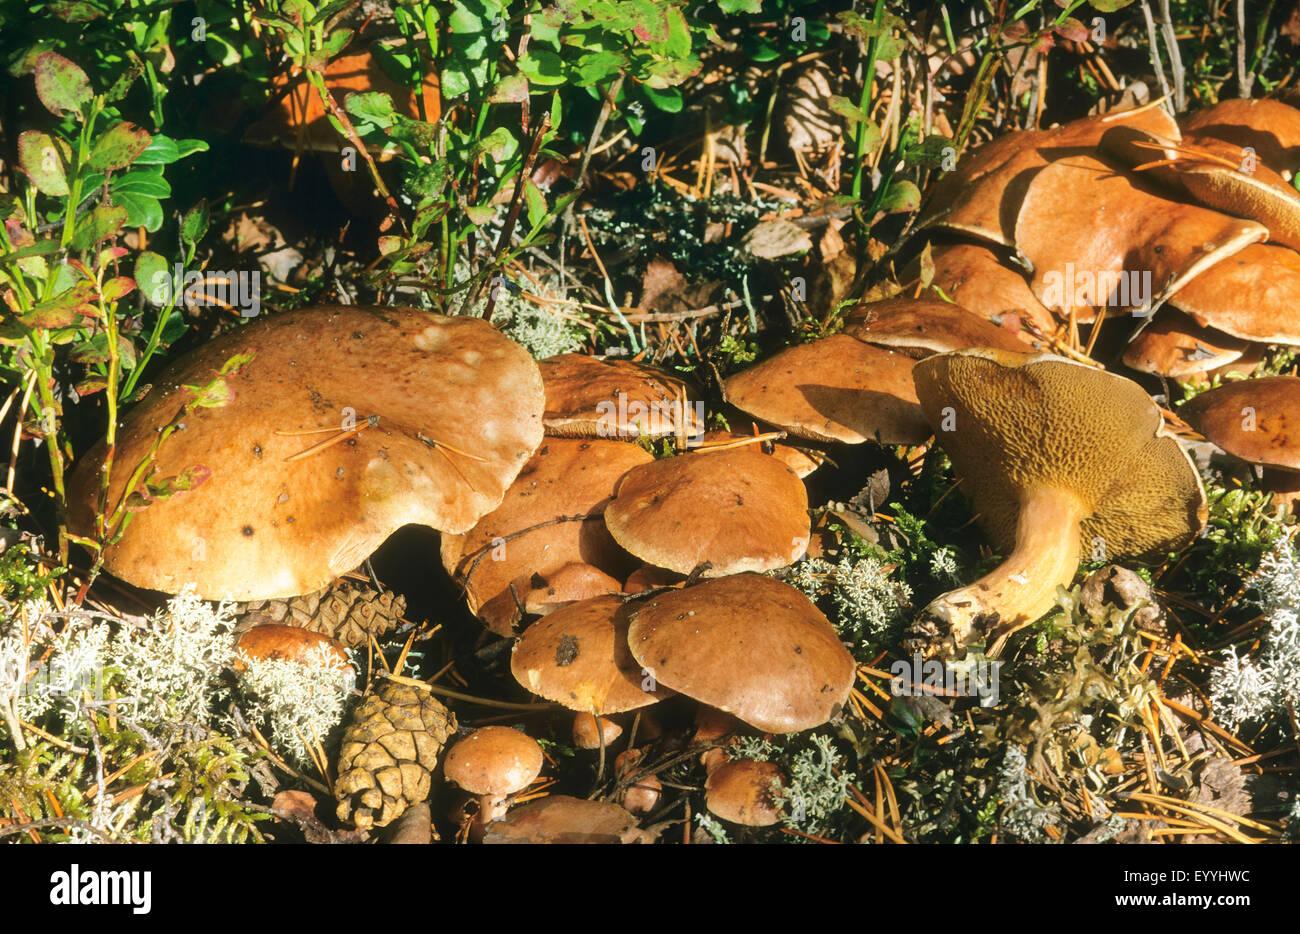 bovine bolete (Suillus bovinus), fruiting bodies on forest ground, Germany - Stock Image